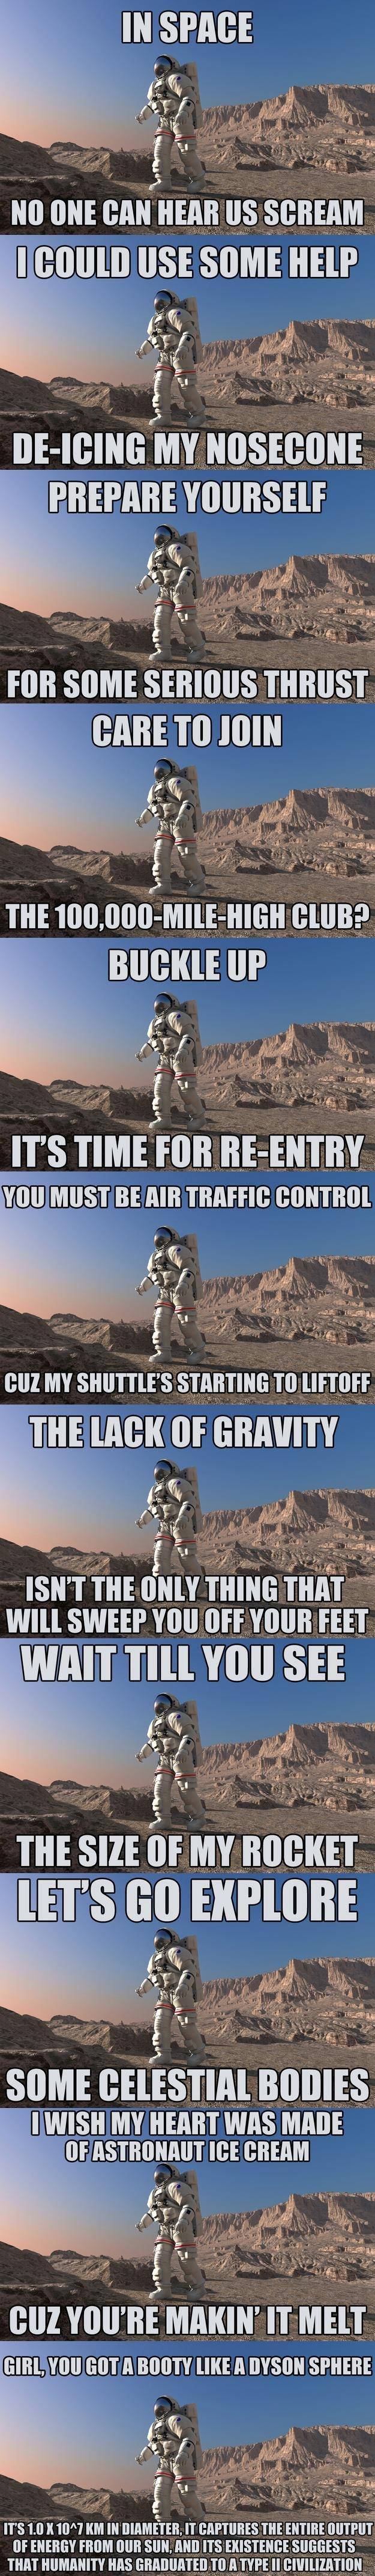 "Astronaut Pickup Lines. HA!. USE SOME Hill' fehl SOME SHHIITT BABE ml"" 233 2 'sat Mil"" III' ITS mair' nii ism fut um fijian mit E f Wwll swan an Inf, SIZE or Ik"